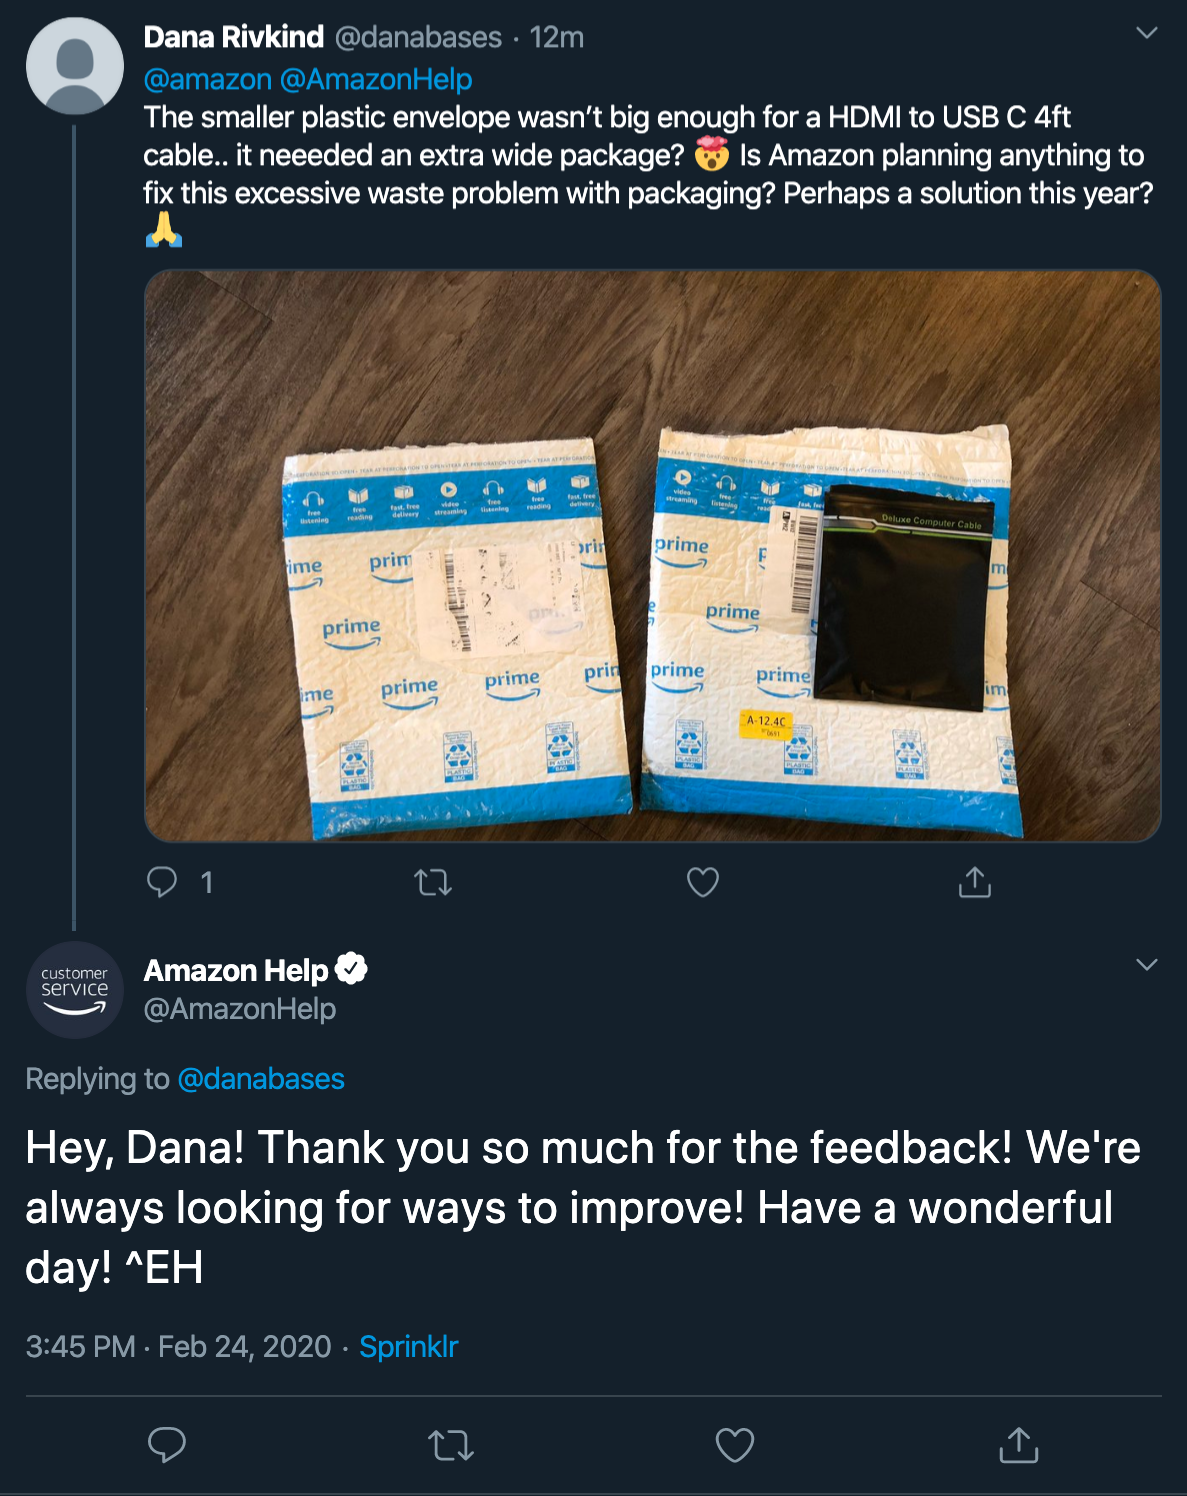 @AmazonHelp self-service